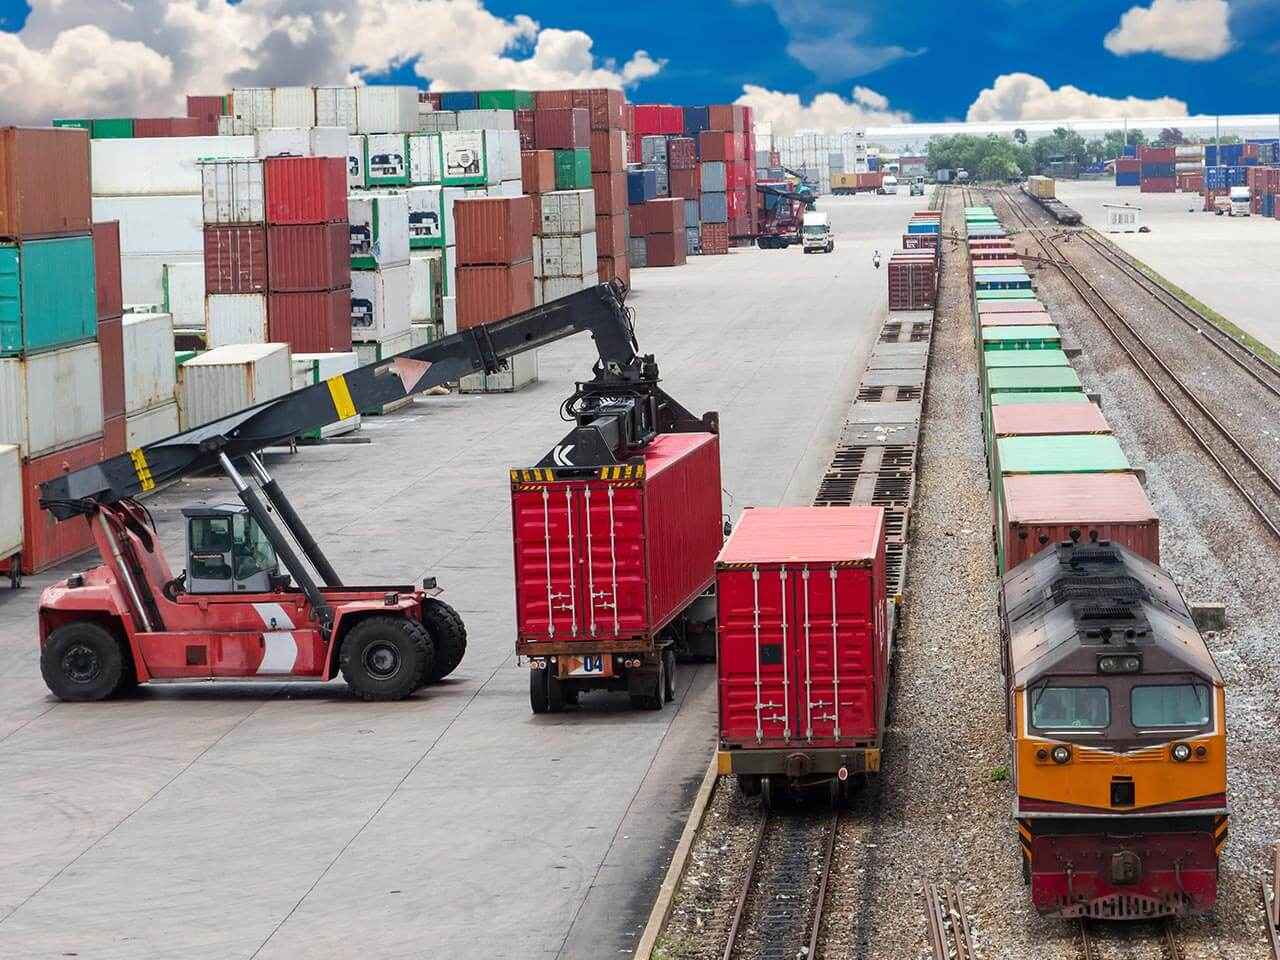 Multimodal rail / road transport in Europe